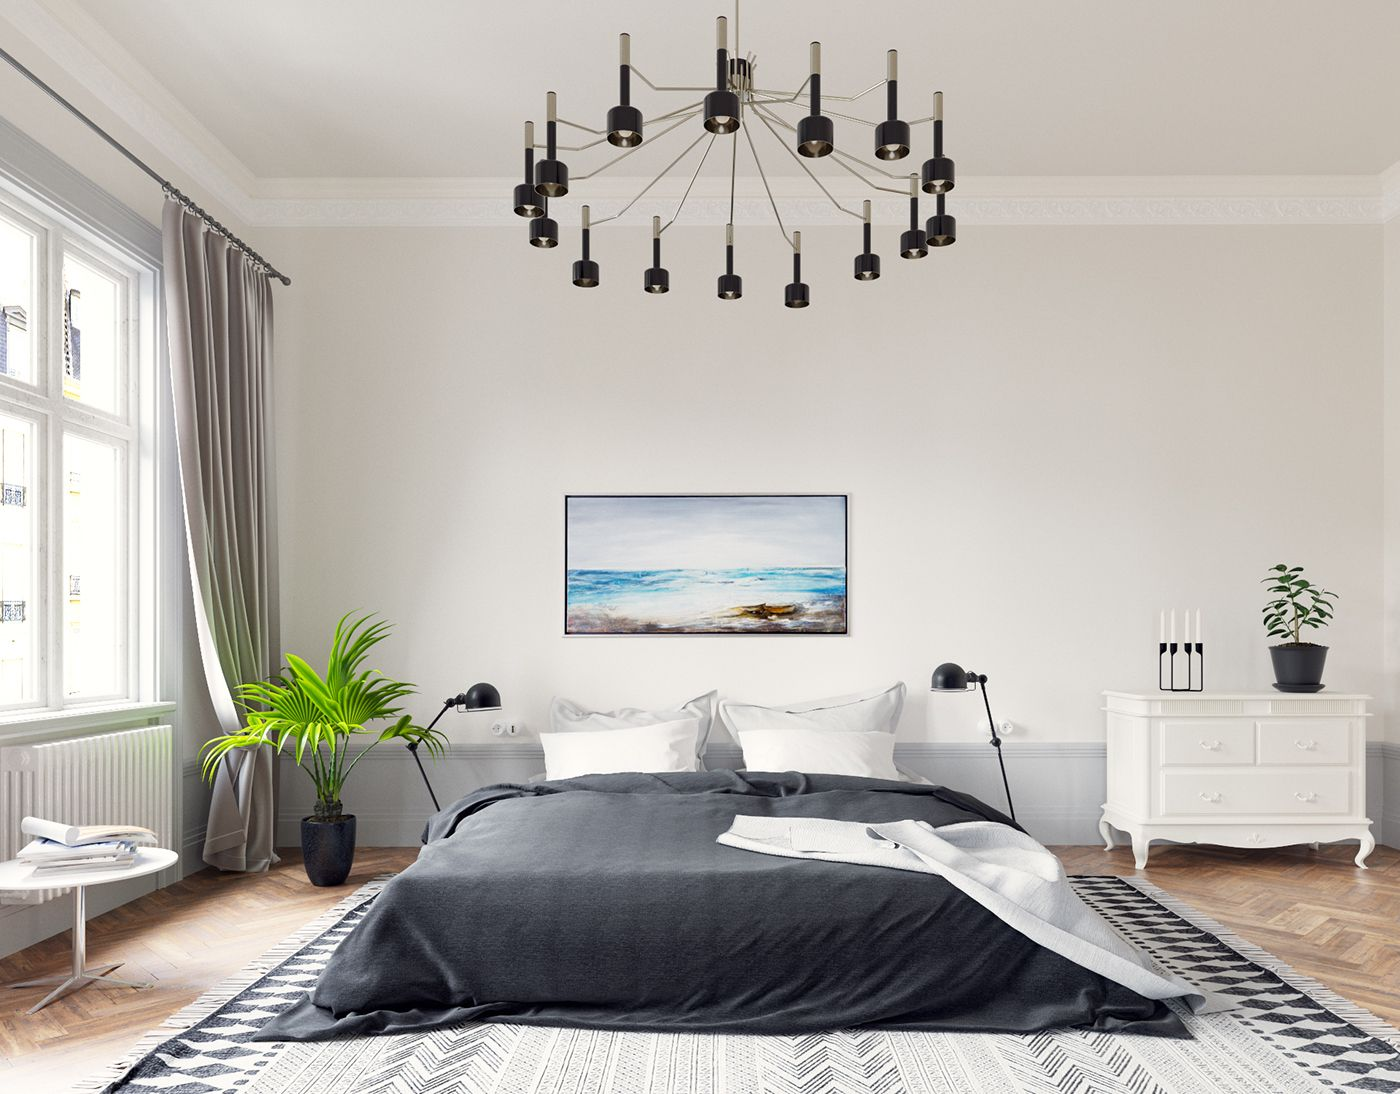 Modern Classic Bedroom Design Ideas Mesmerizing Stunning Modern Classic Bedroom Design With Dazzling Lighting Design Inspiration